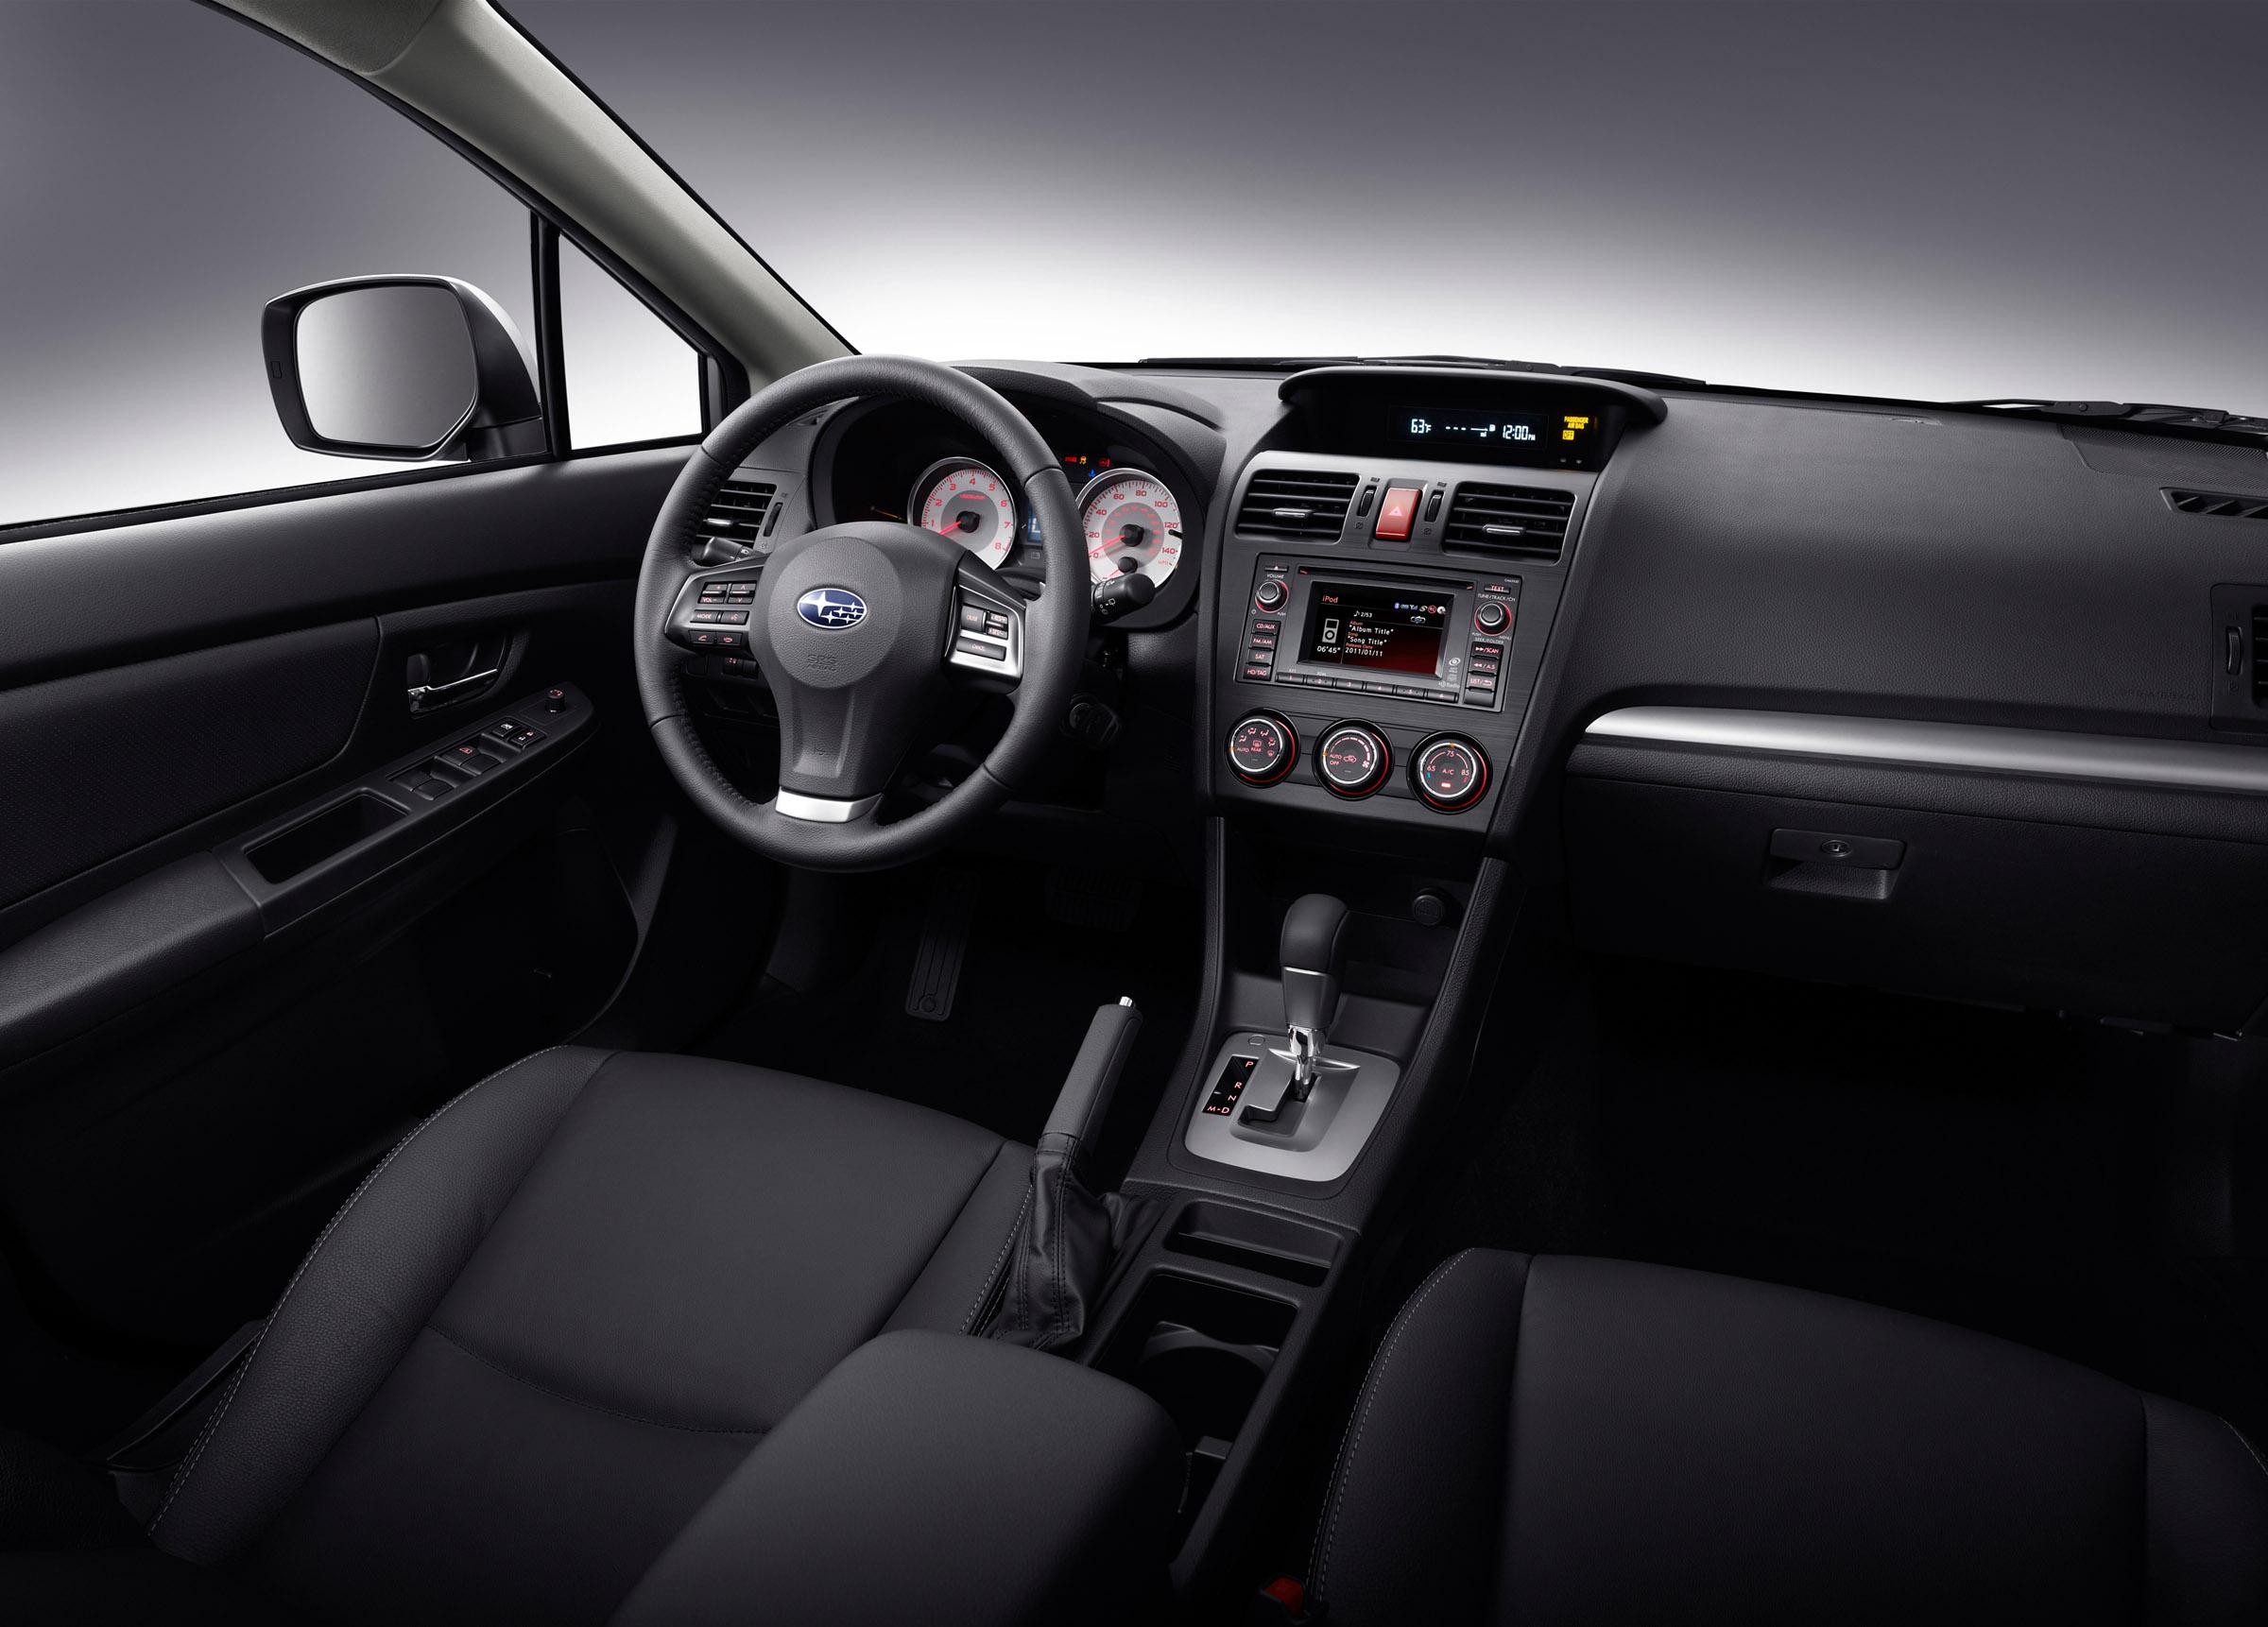 2012 Subaru Impreza официально представила - фотография №3